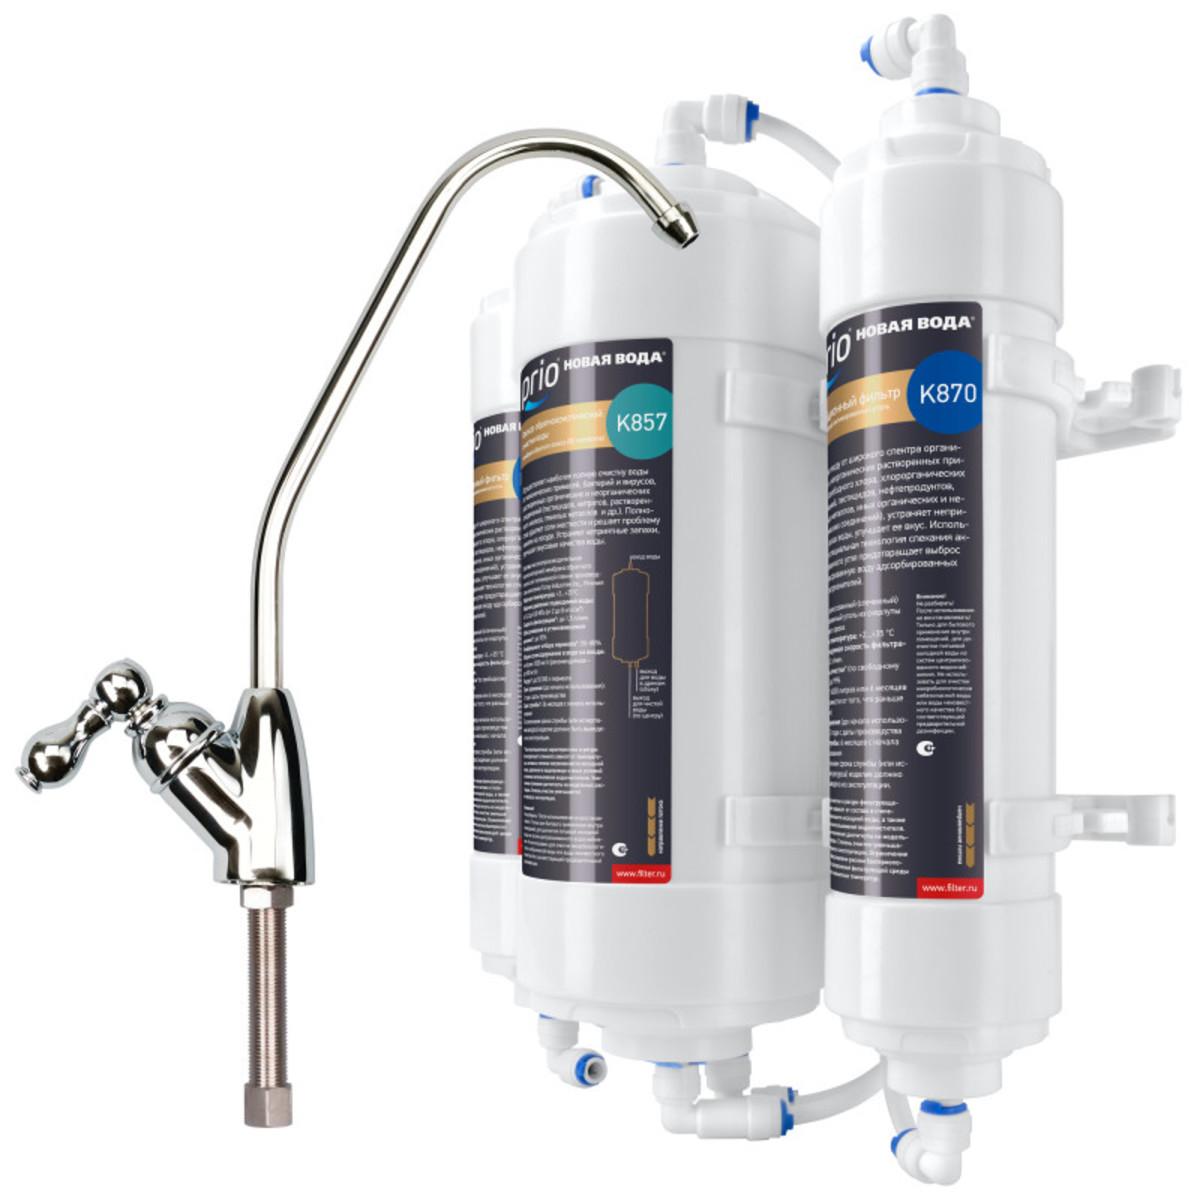 Система обратного осмоса Prio Новая Вода Econic Osmos OD310